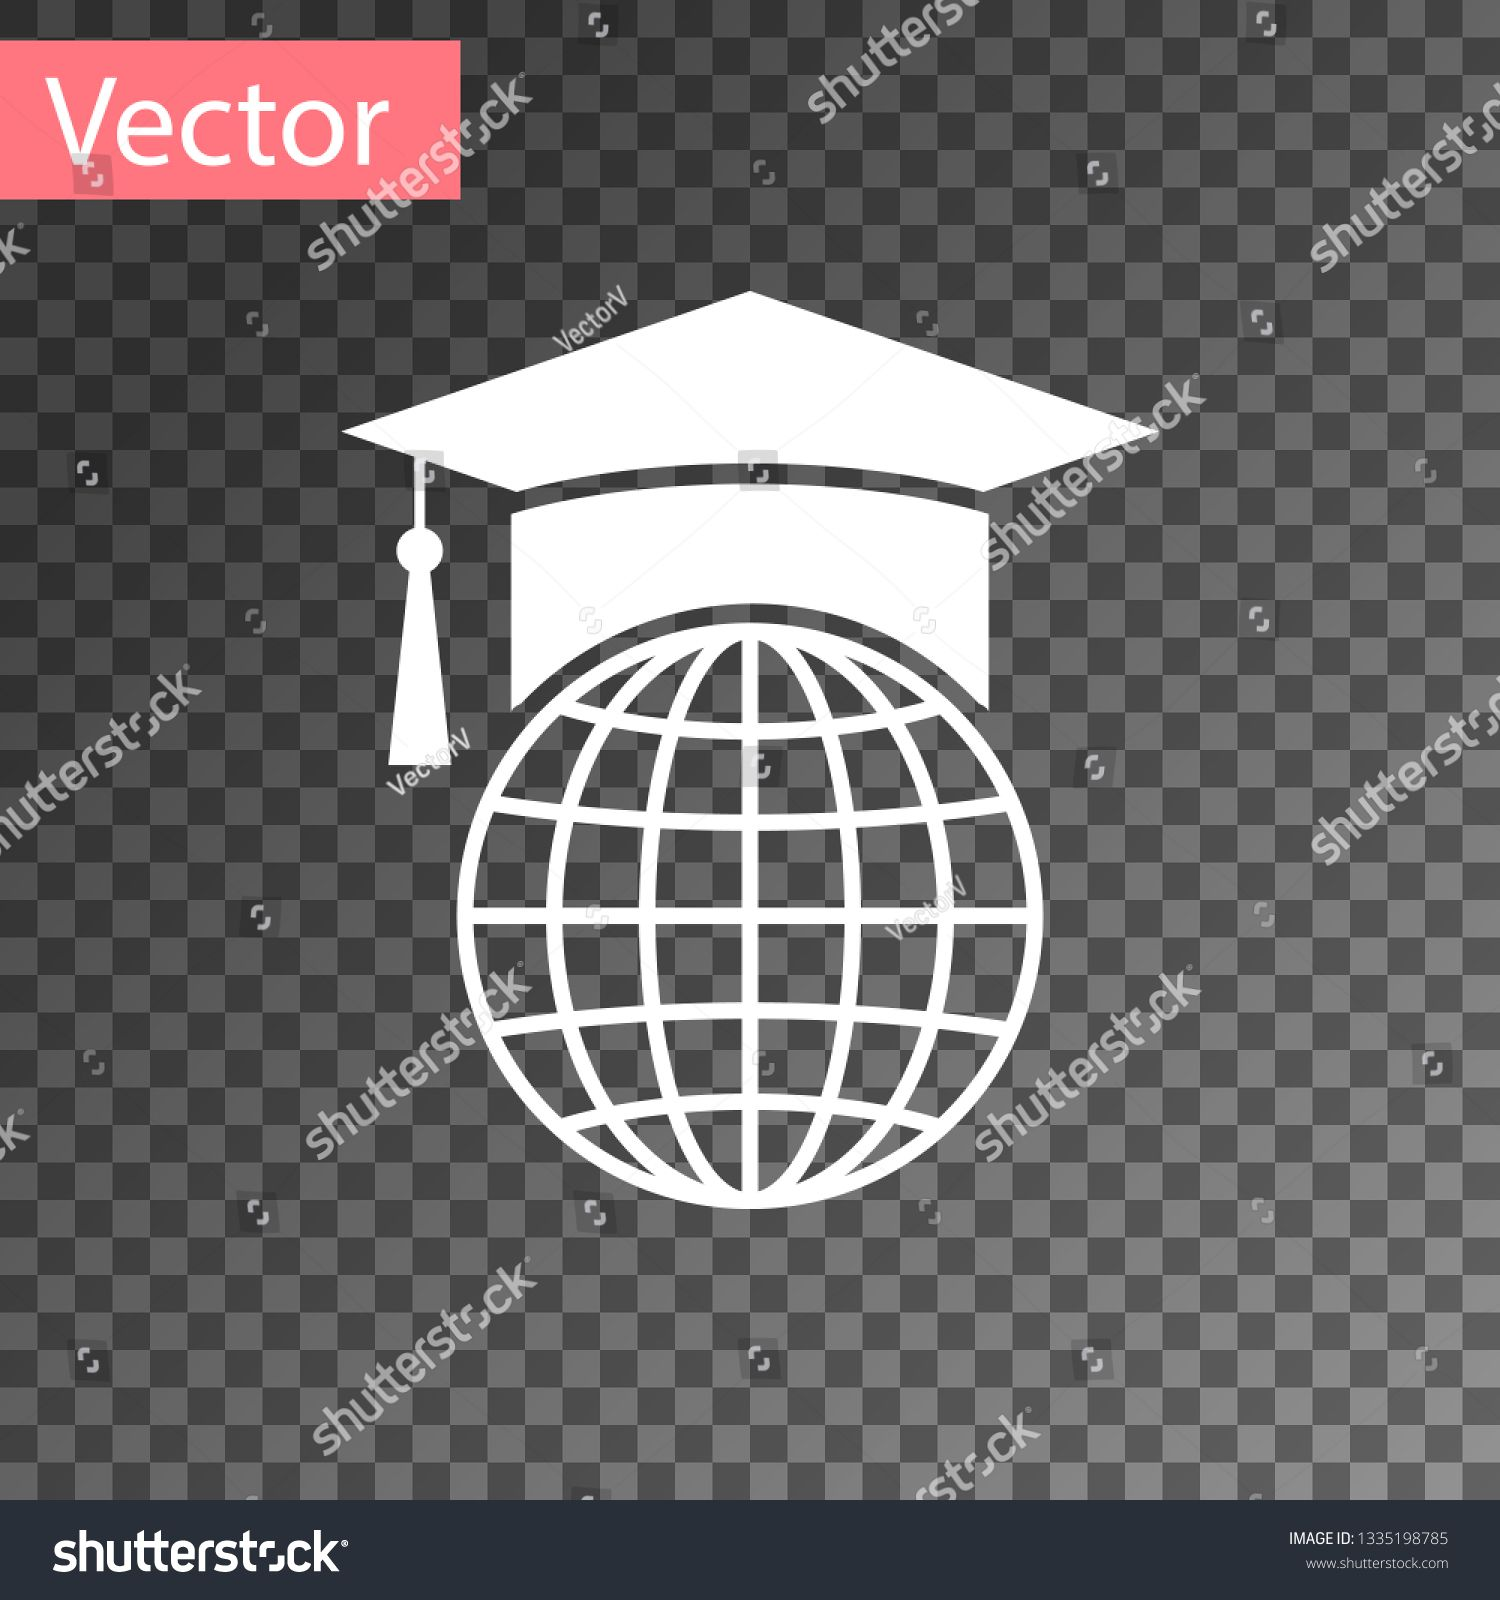 White Graduation Cap On Globe Icon Isolated On Transparent